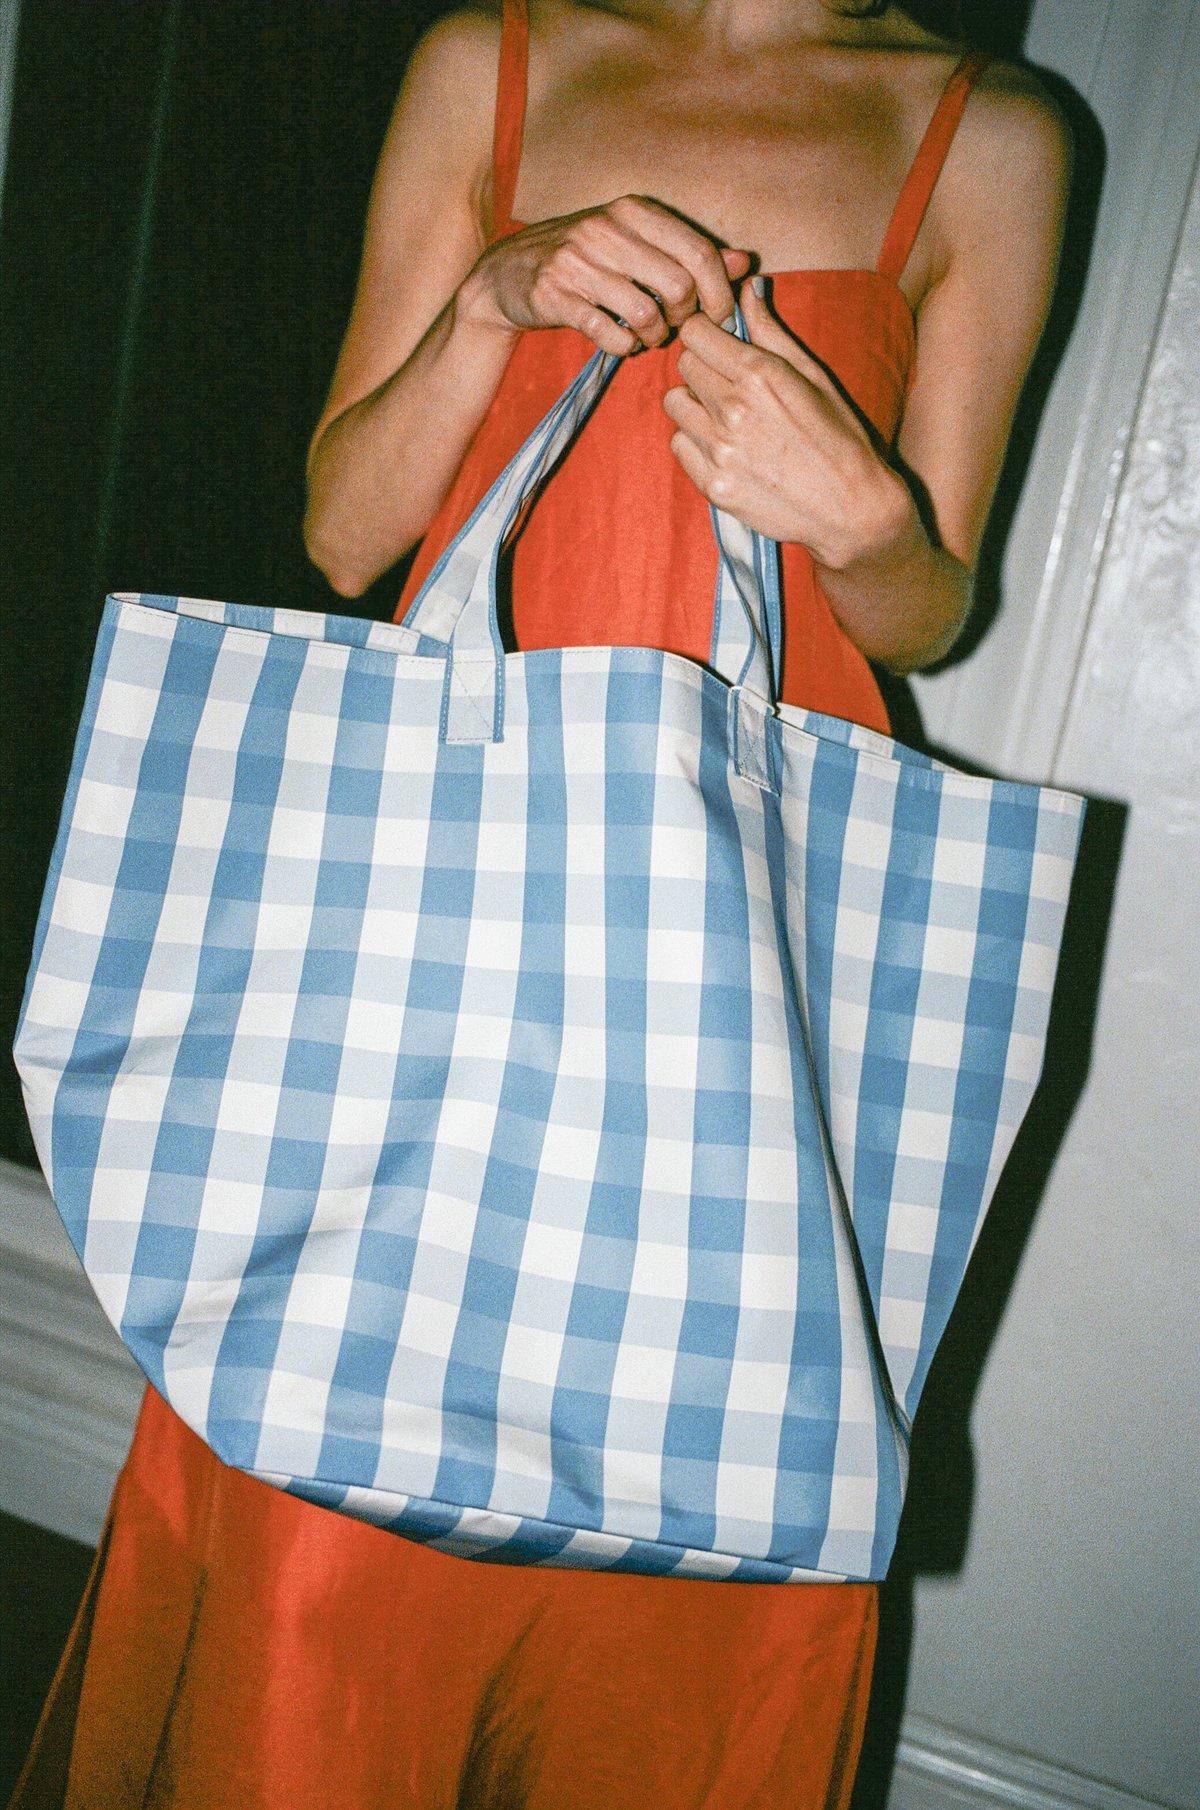 Trademark Large Gingham Grocery Bag - Blue/Cream   Garmentory